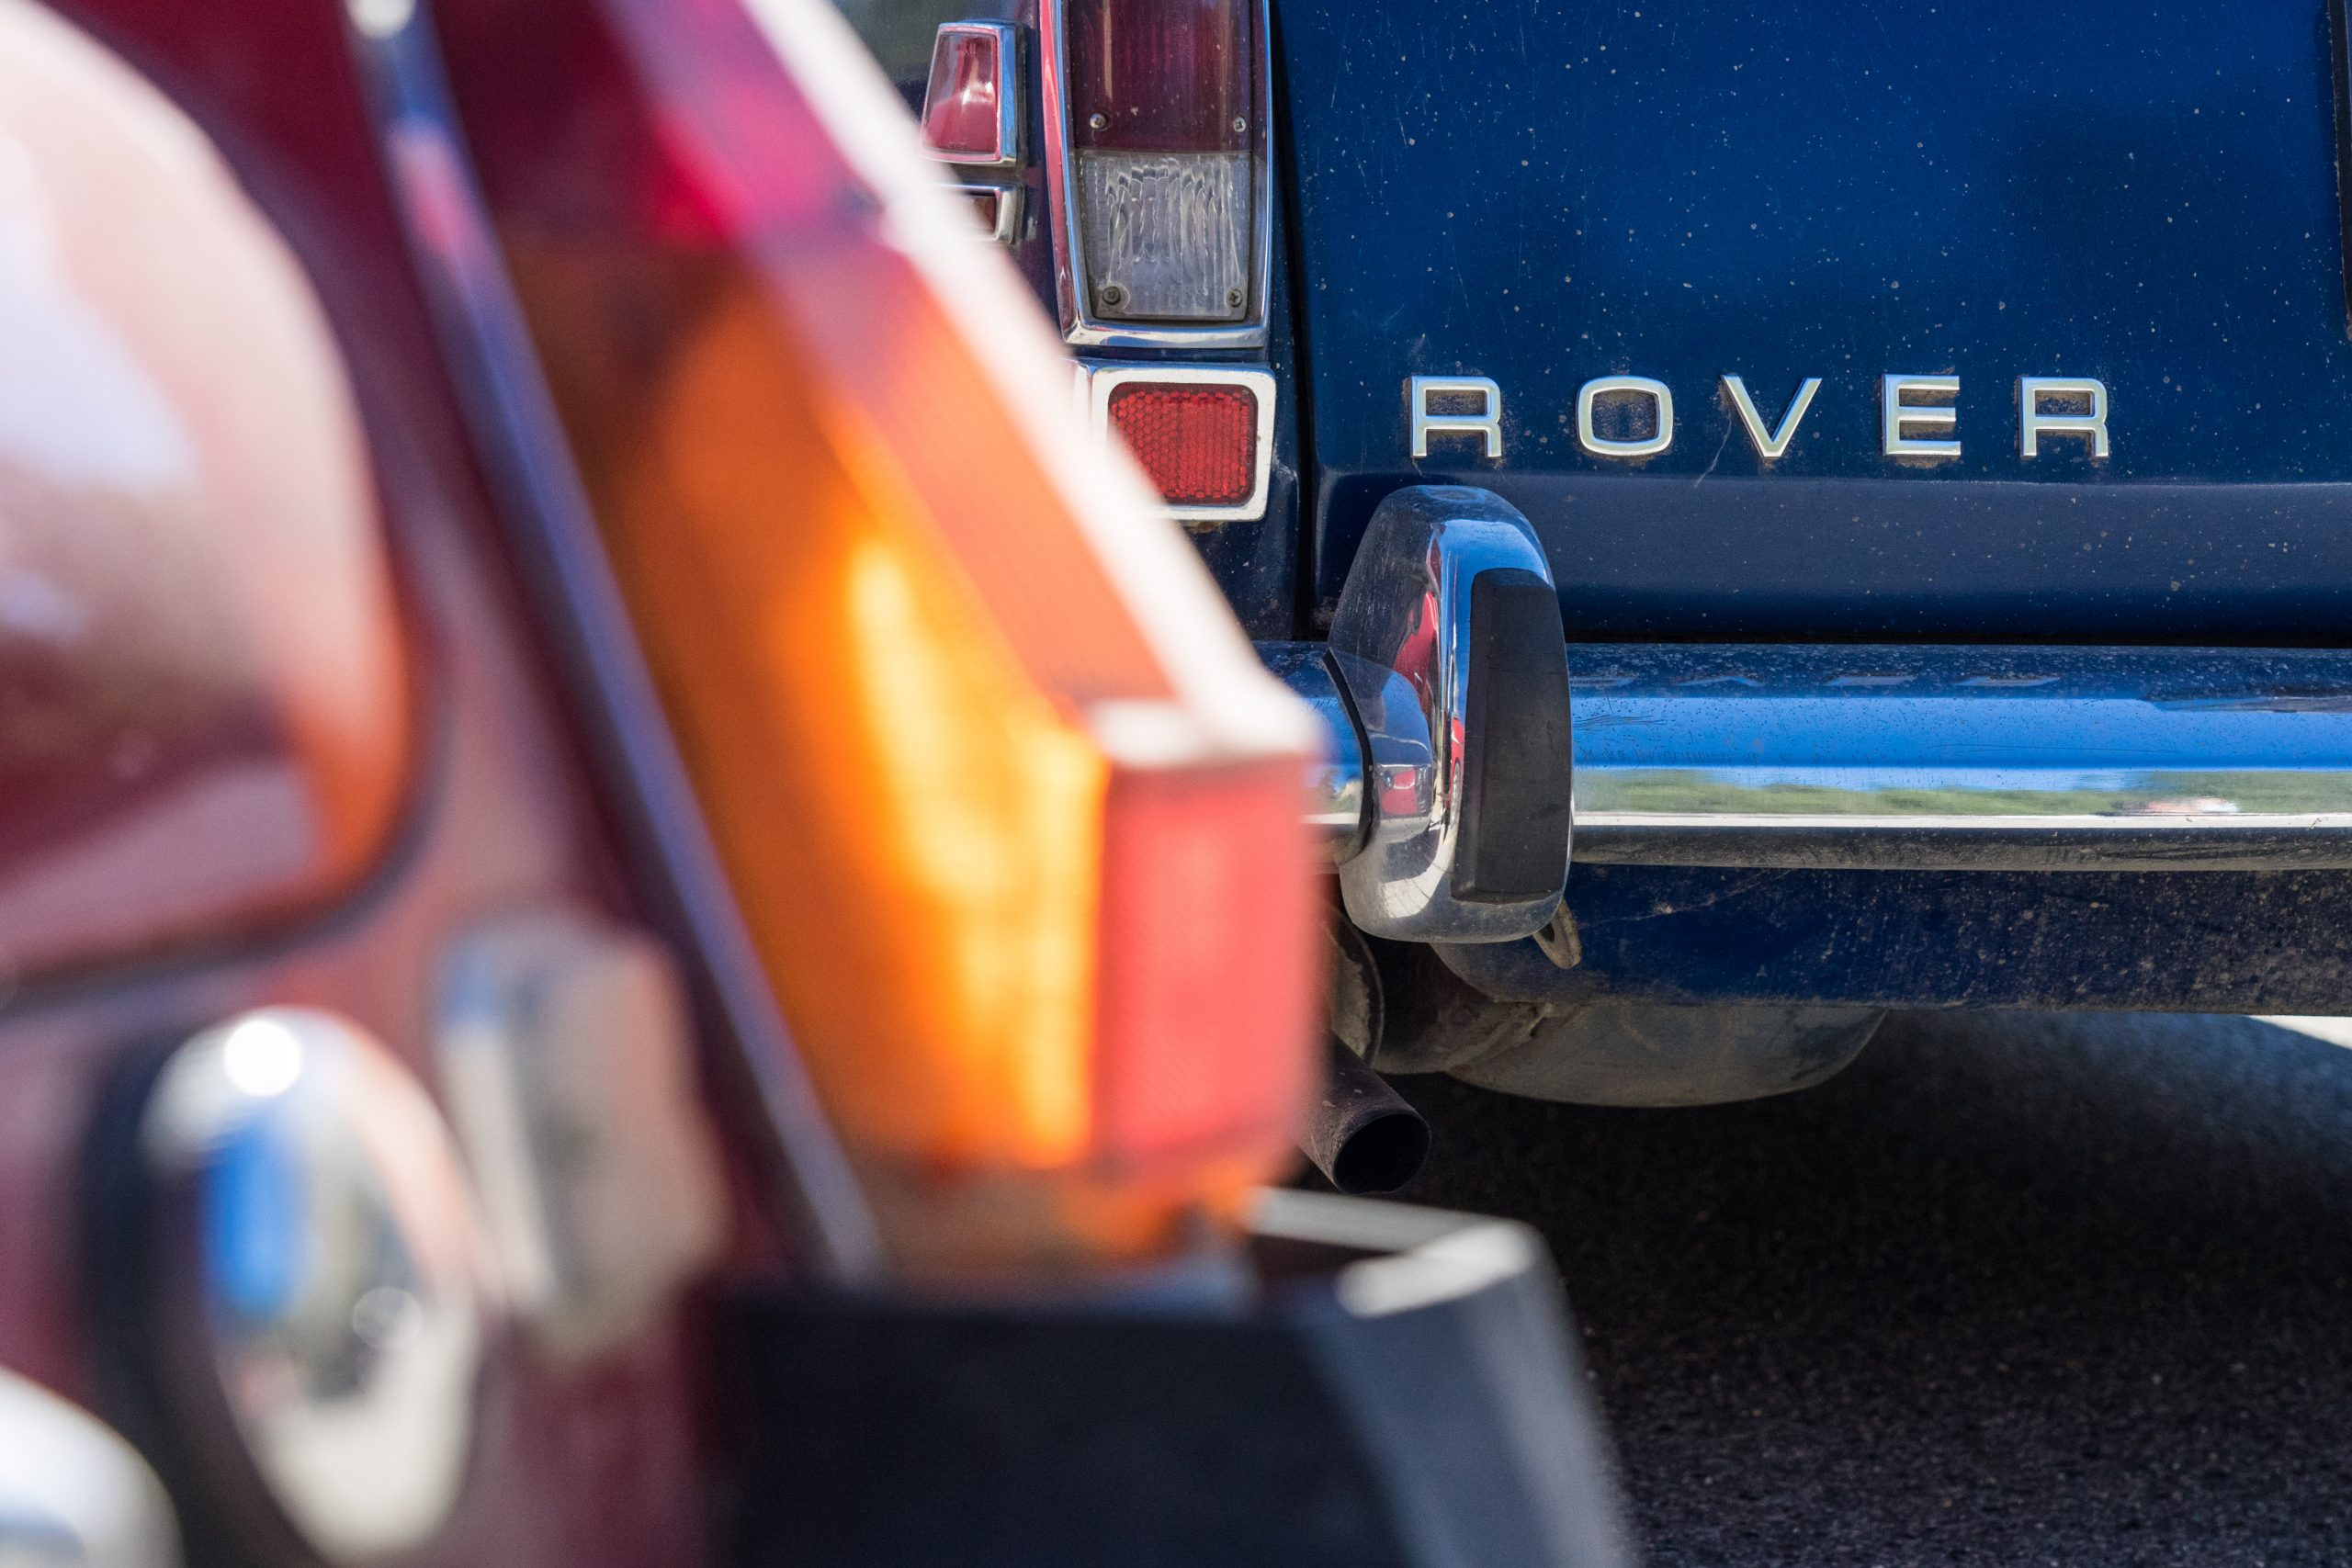 rush to gold bridge rover car badge